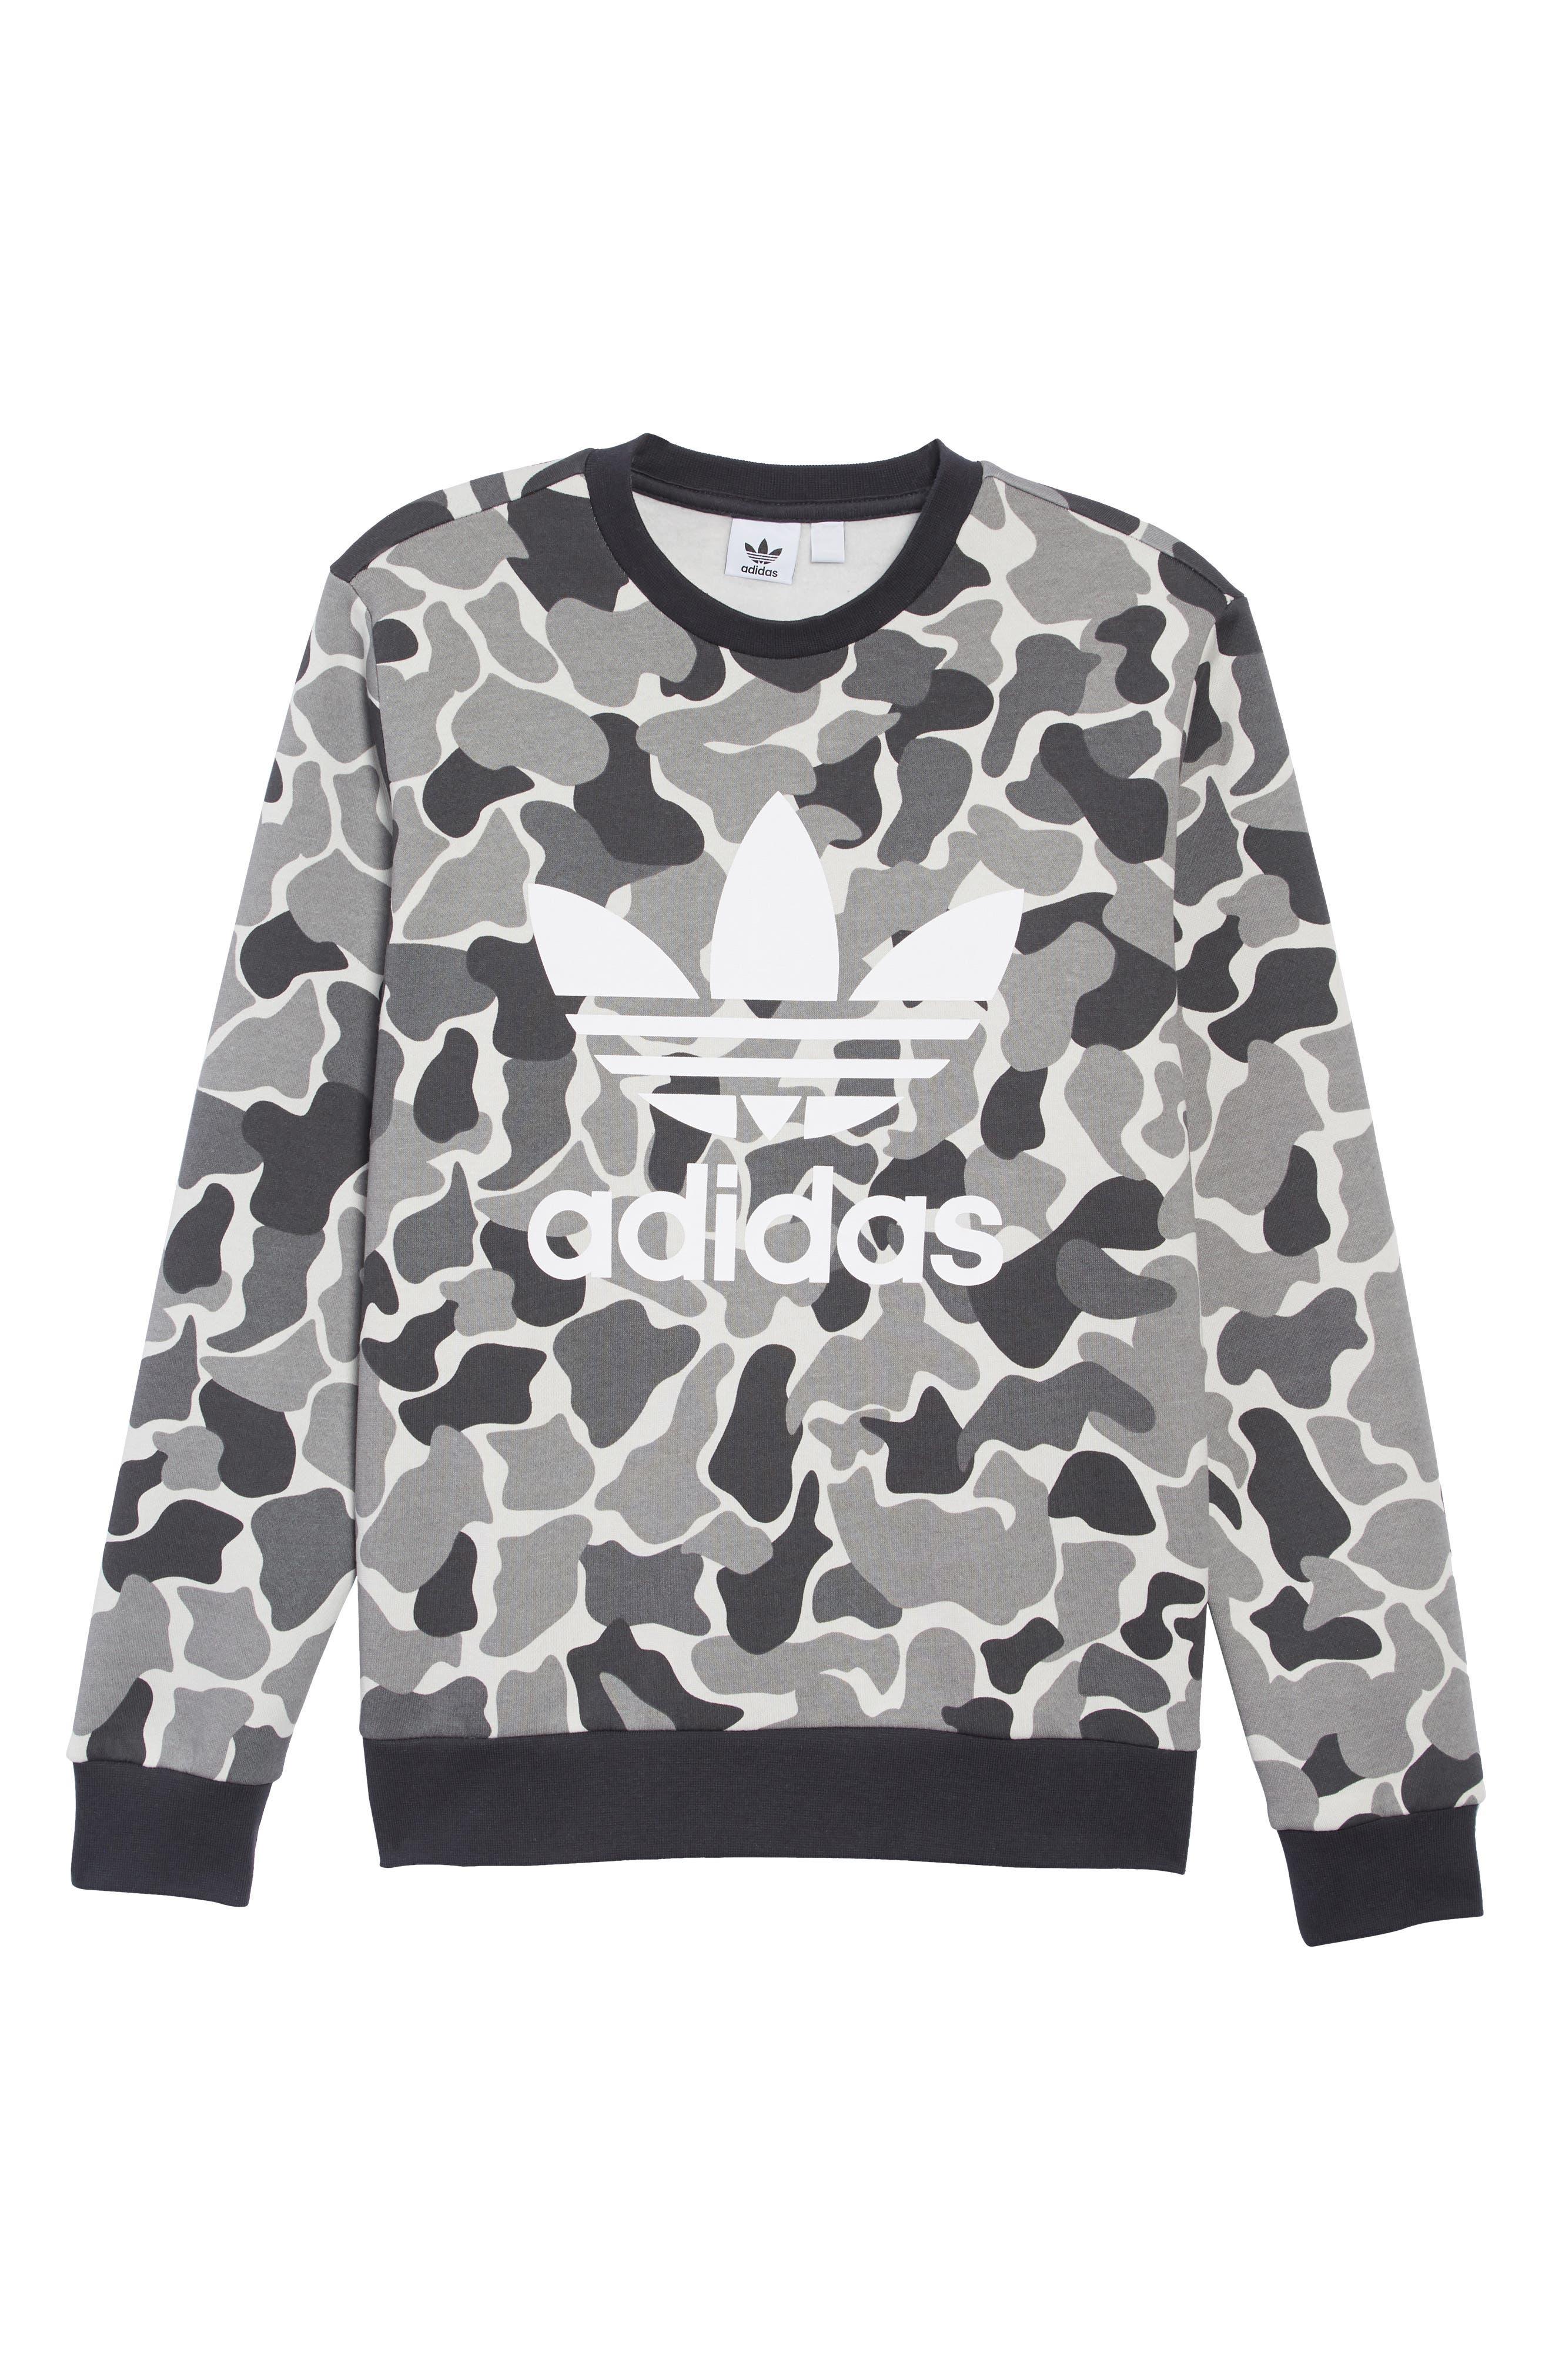 Boys Adidas Originals Trefoil Crewneck Sweatshirt